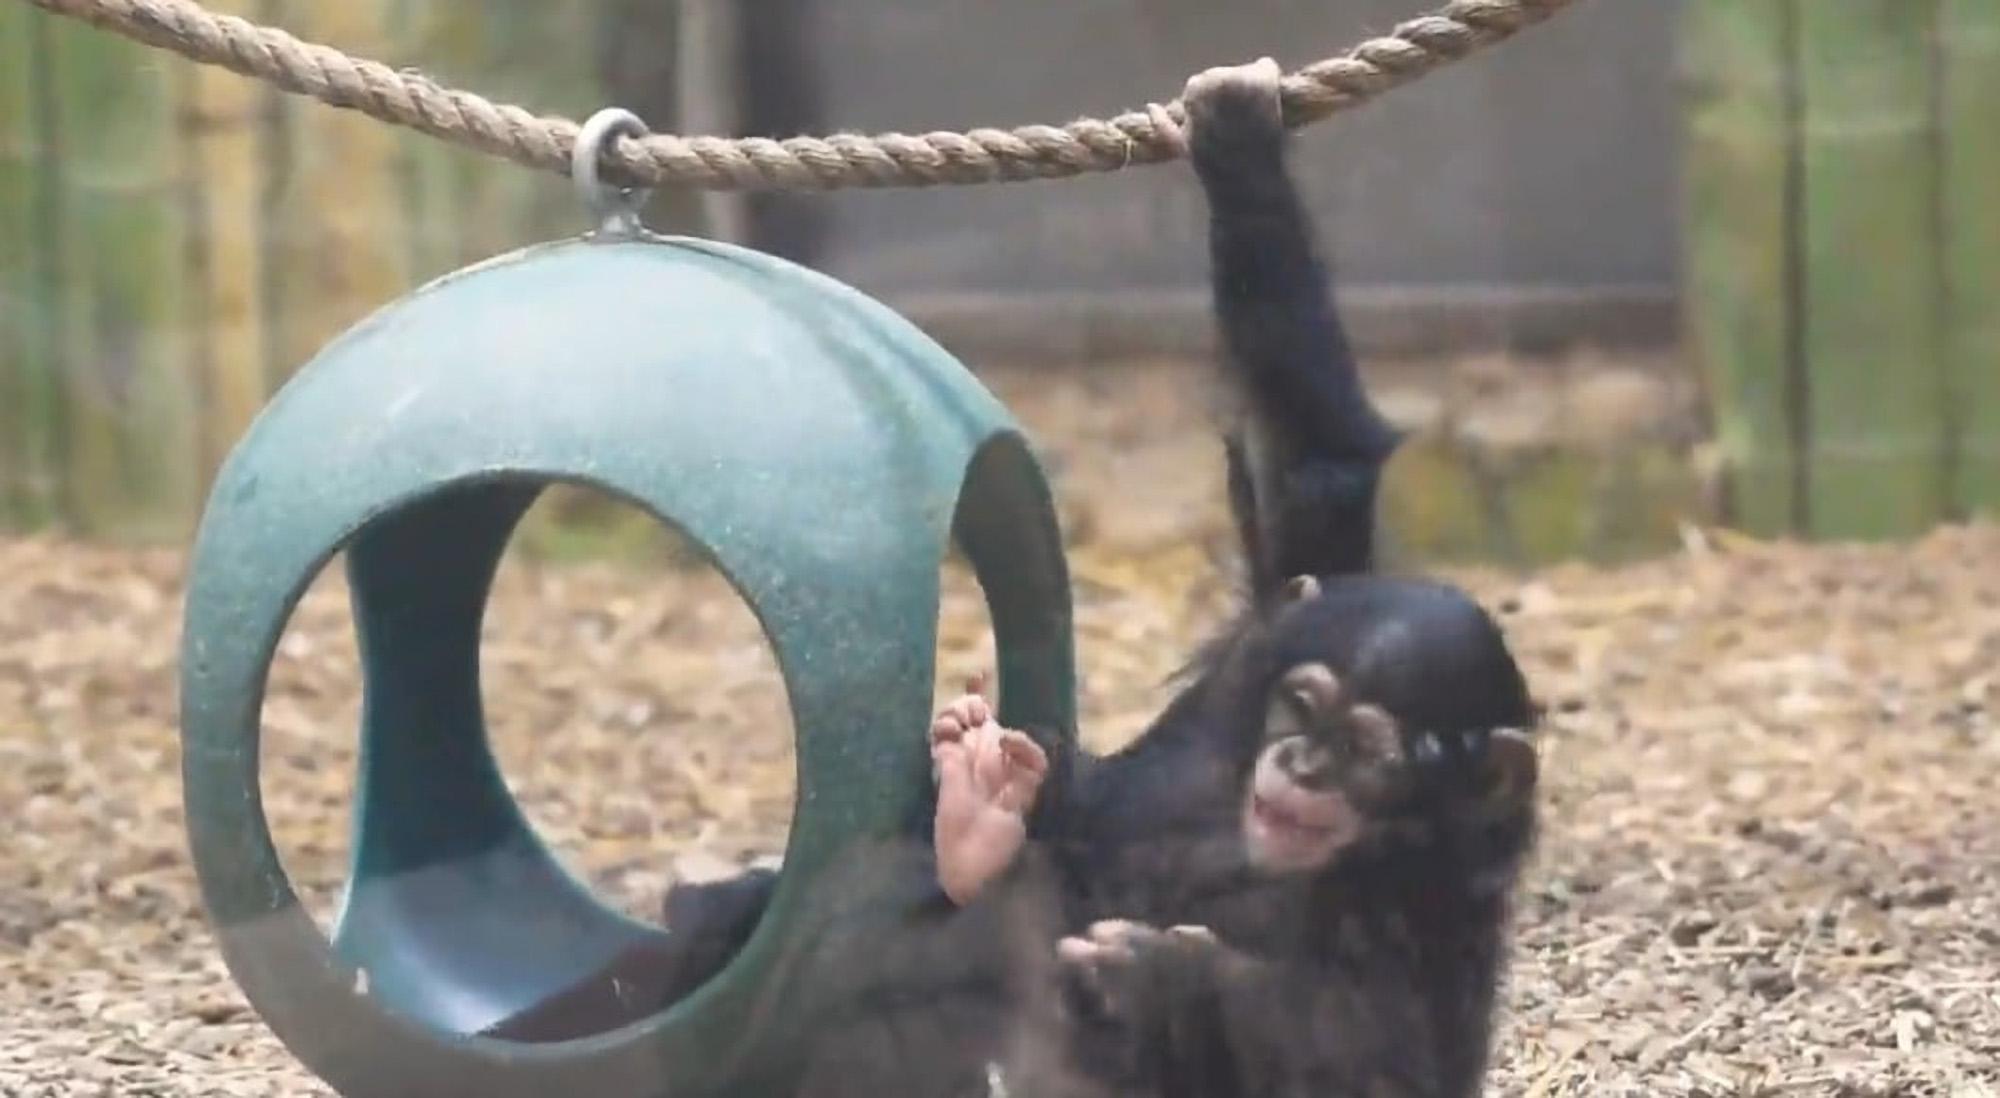 VIDEO: Chimpan-See: Baby Lola Desperate To Grab Pink Blanket That Caught Her Eye